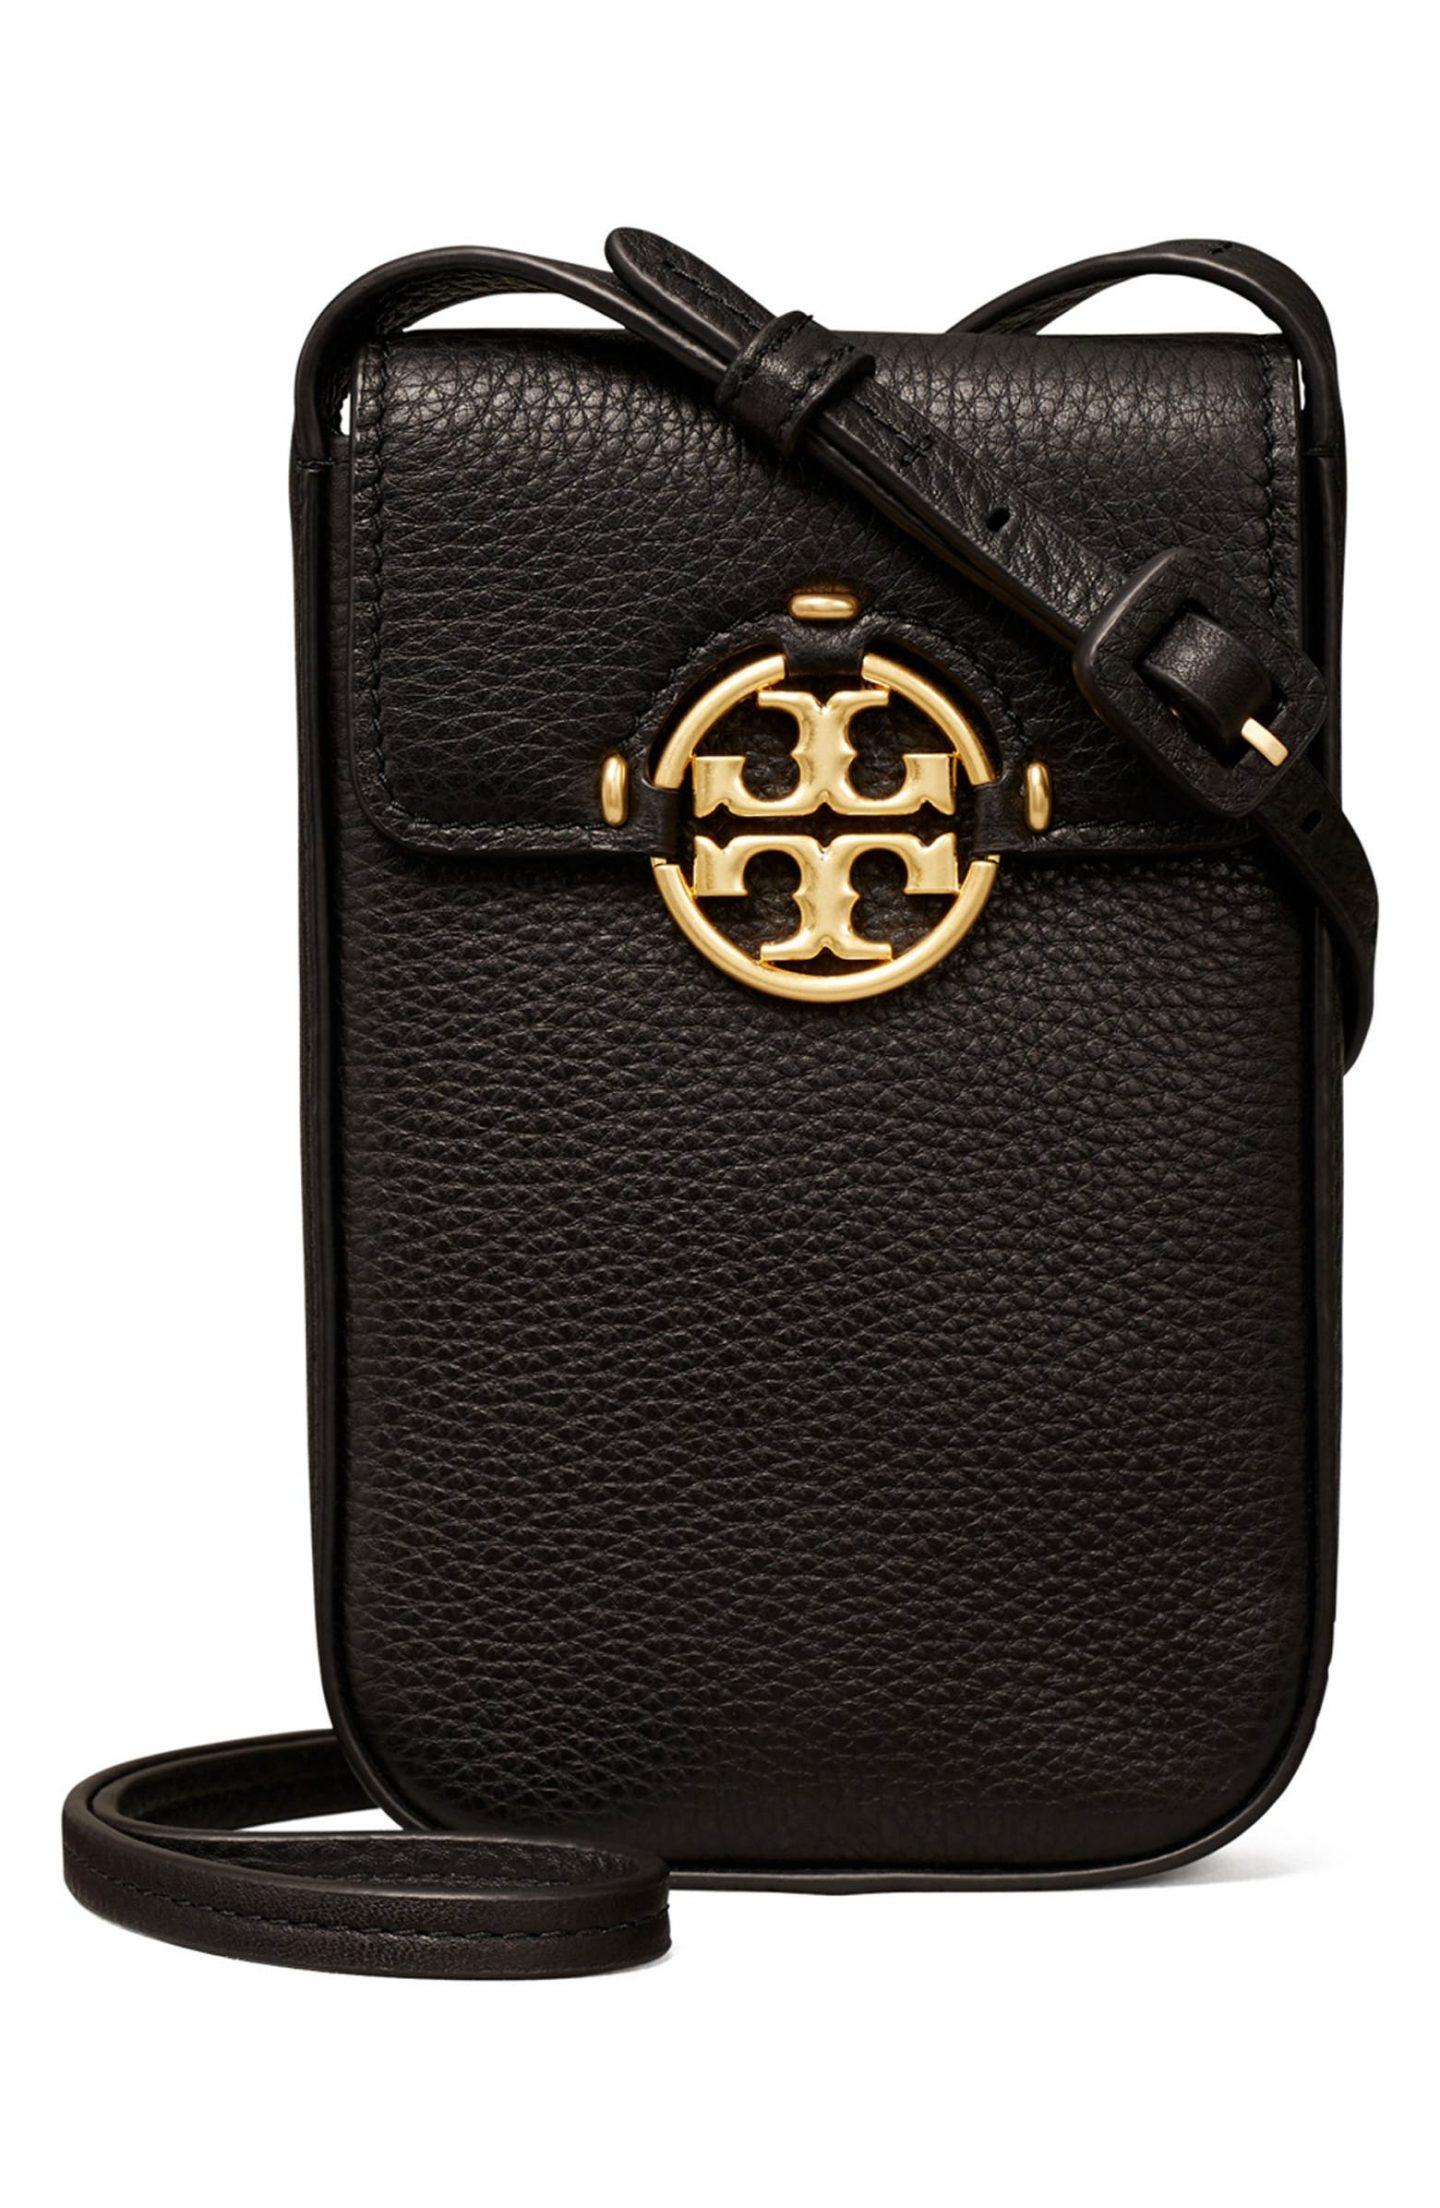 Black Tory Burch Phone bag for best minimalist purses